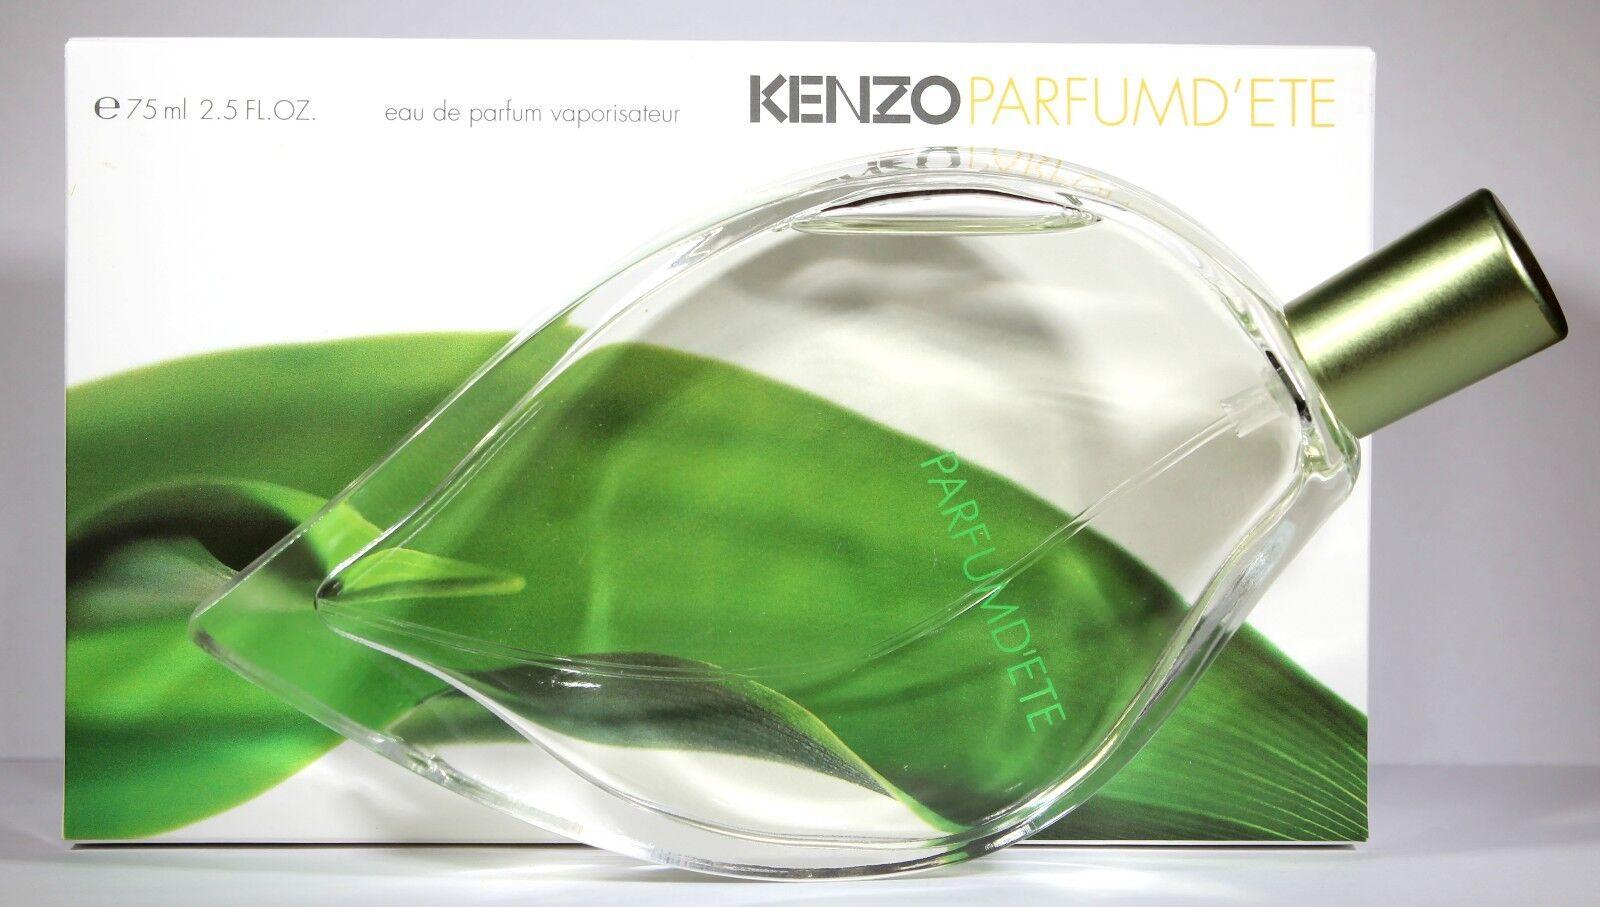 Kenzo Dete Edp Eau De Parfum Spray 75ml Womens Perfume Ebay Flower Woman Edt 100 Ml Original Free Vial Norton Secured Powered By Verisign